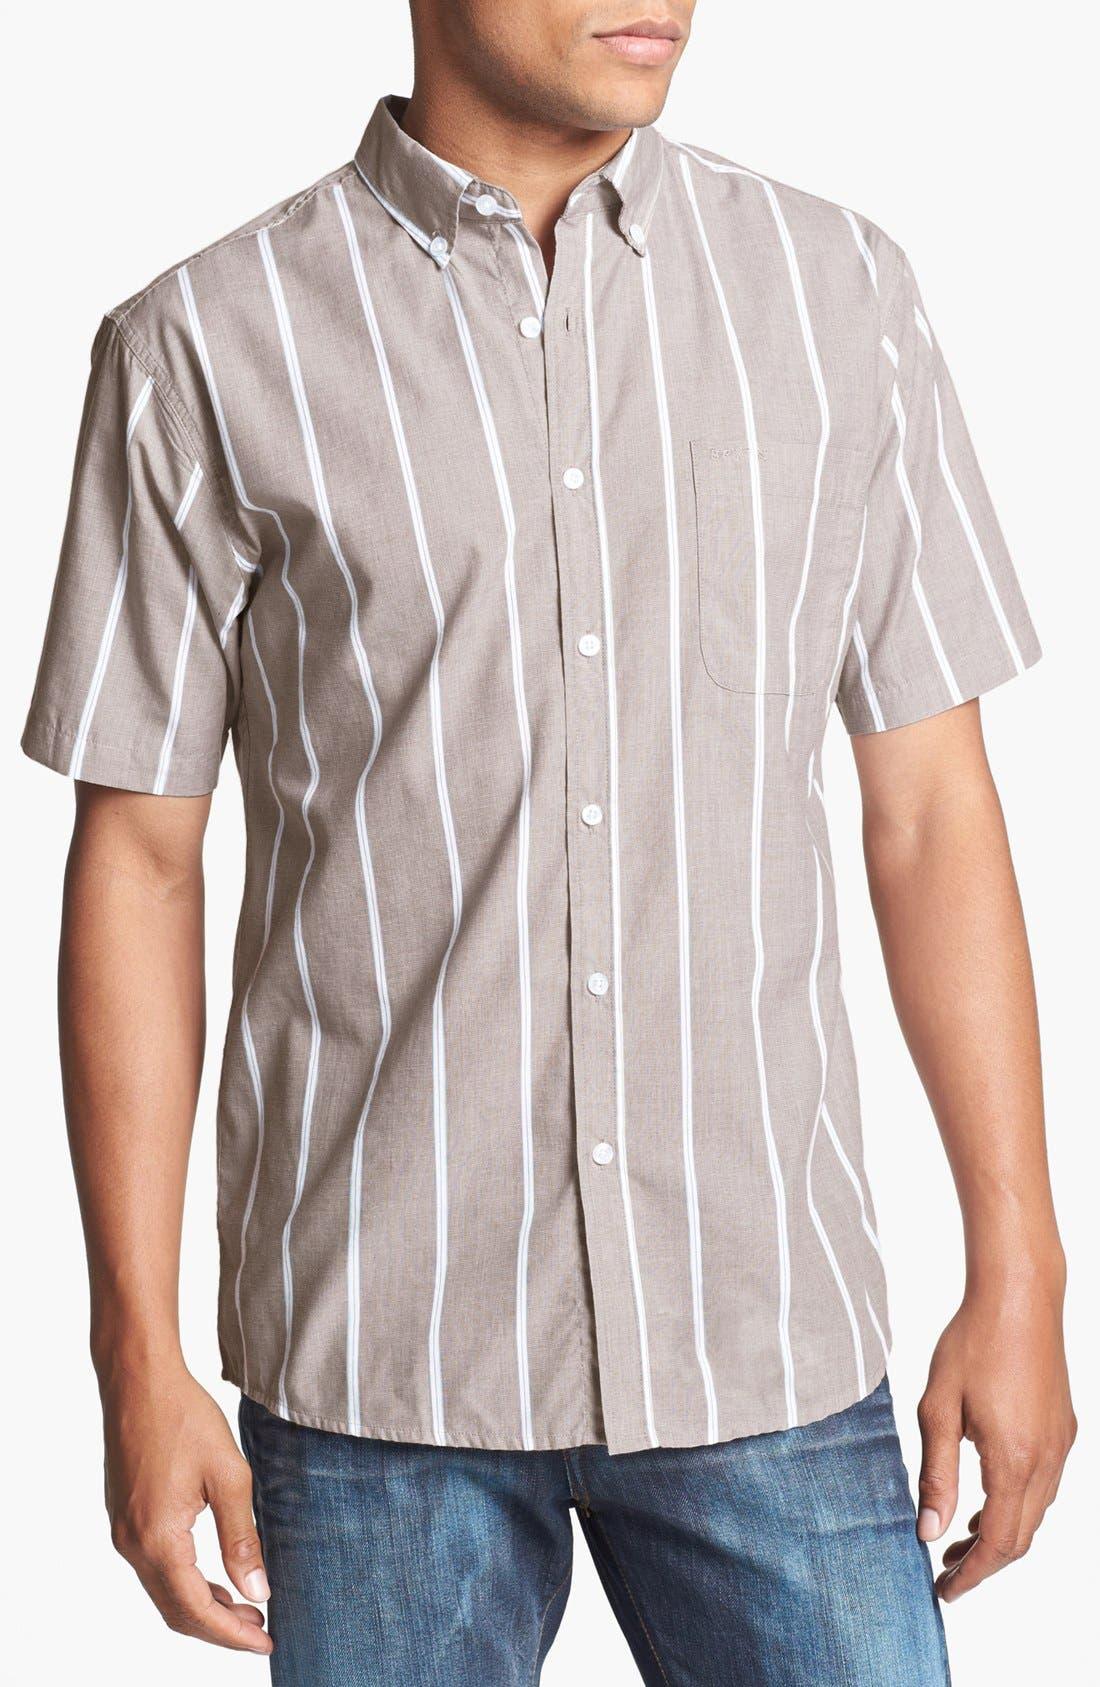 Main Image - Brixton 'Baylor' Stripe Oxford Shirt